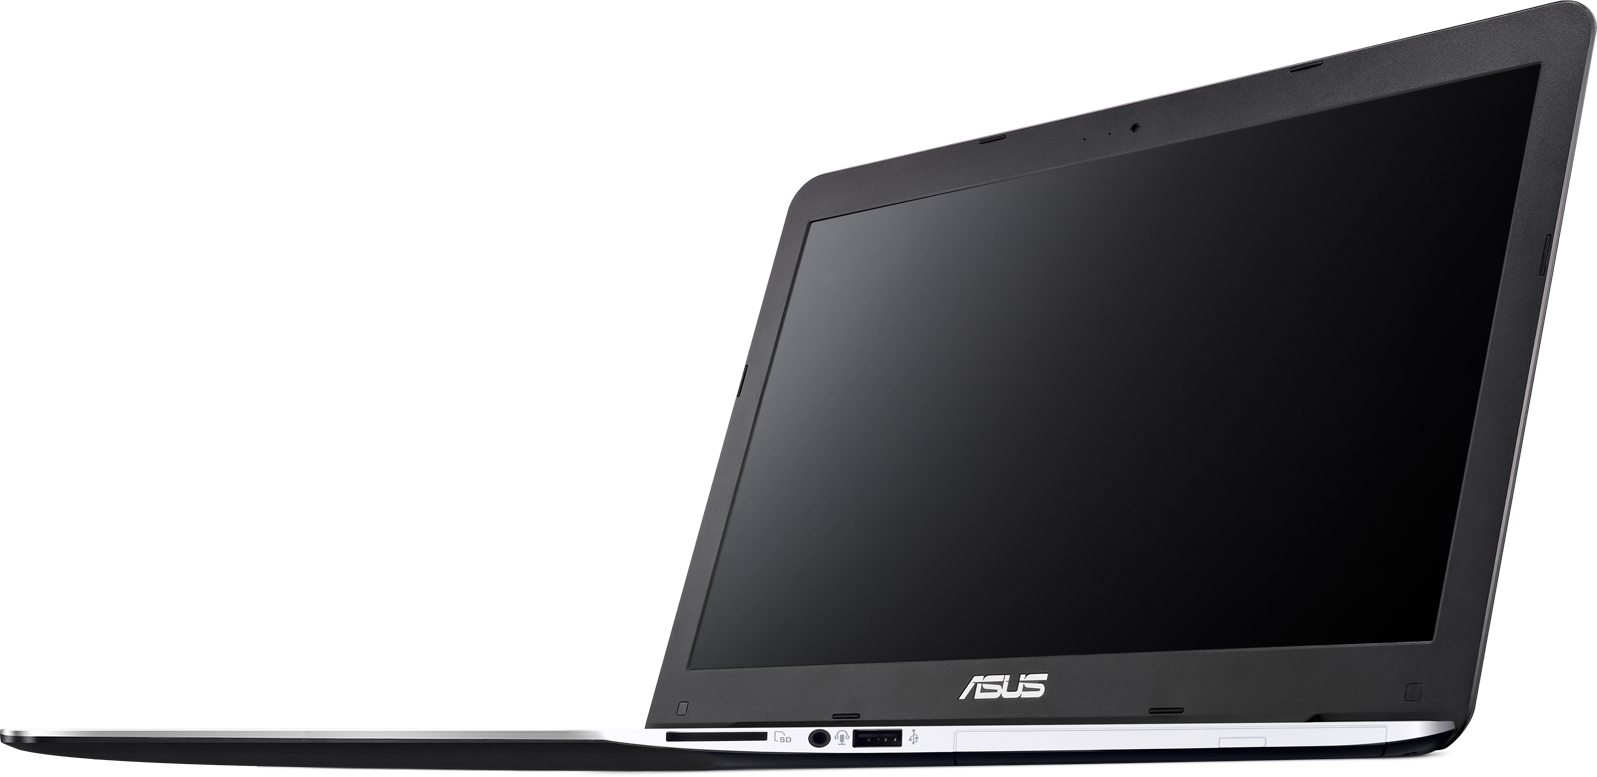 X555ln Laptops Asus Global